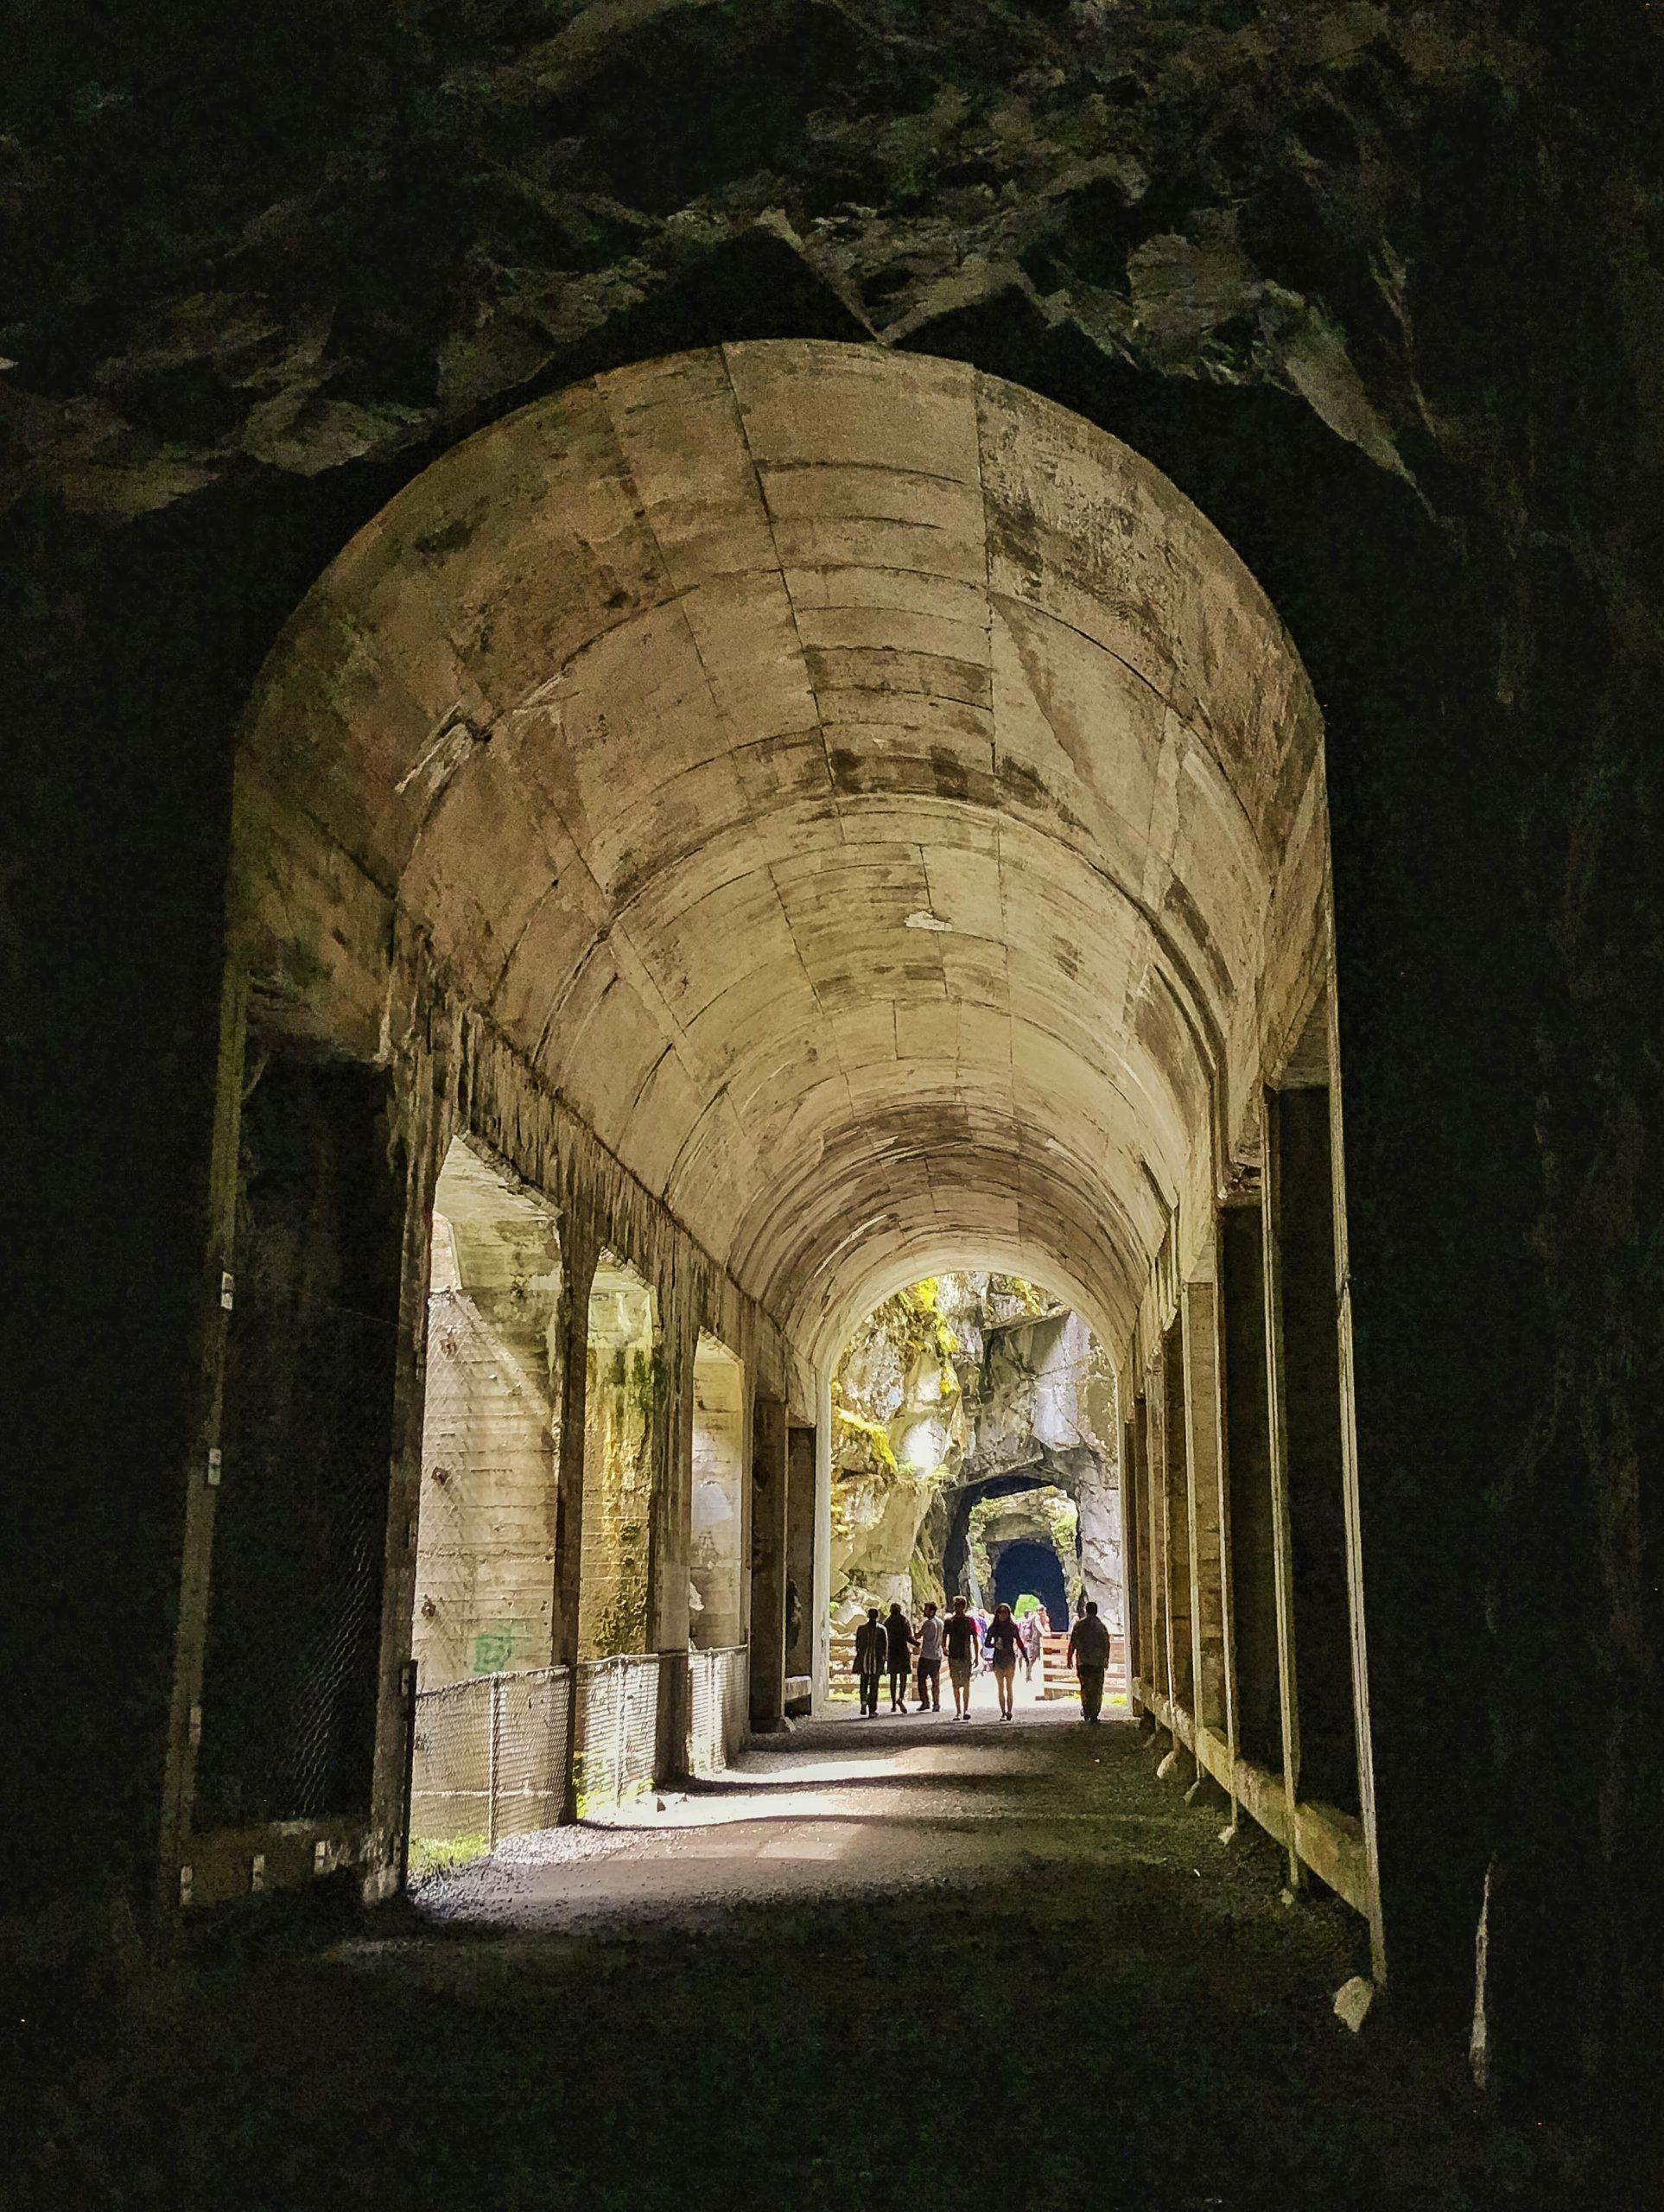 Othello Tunnels, Hope, BC Canada